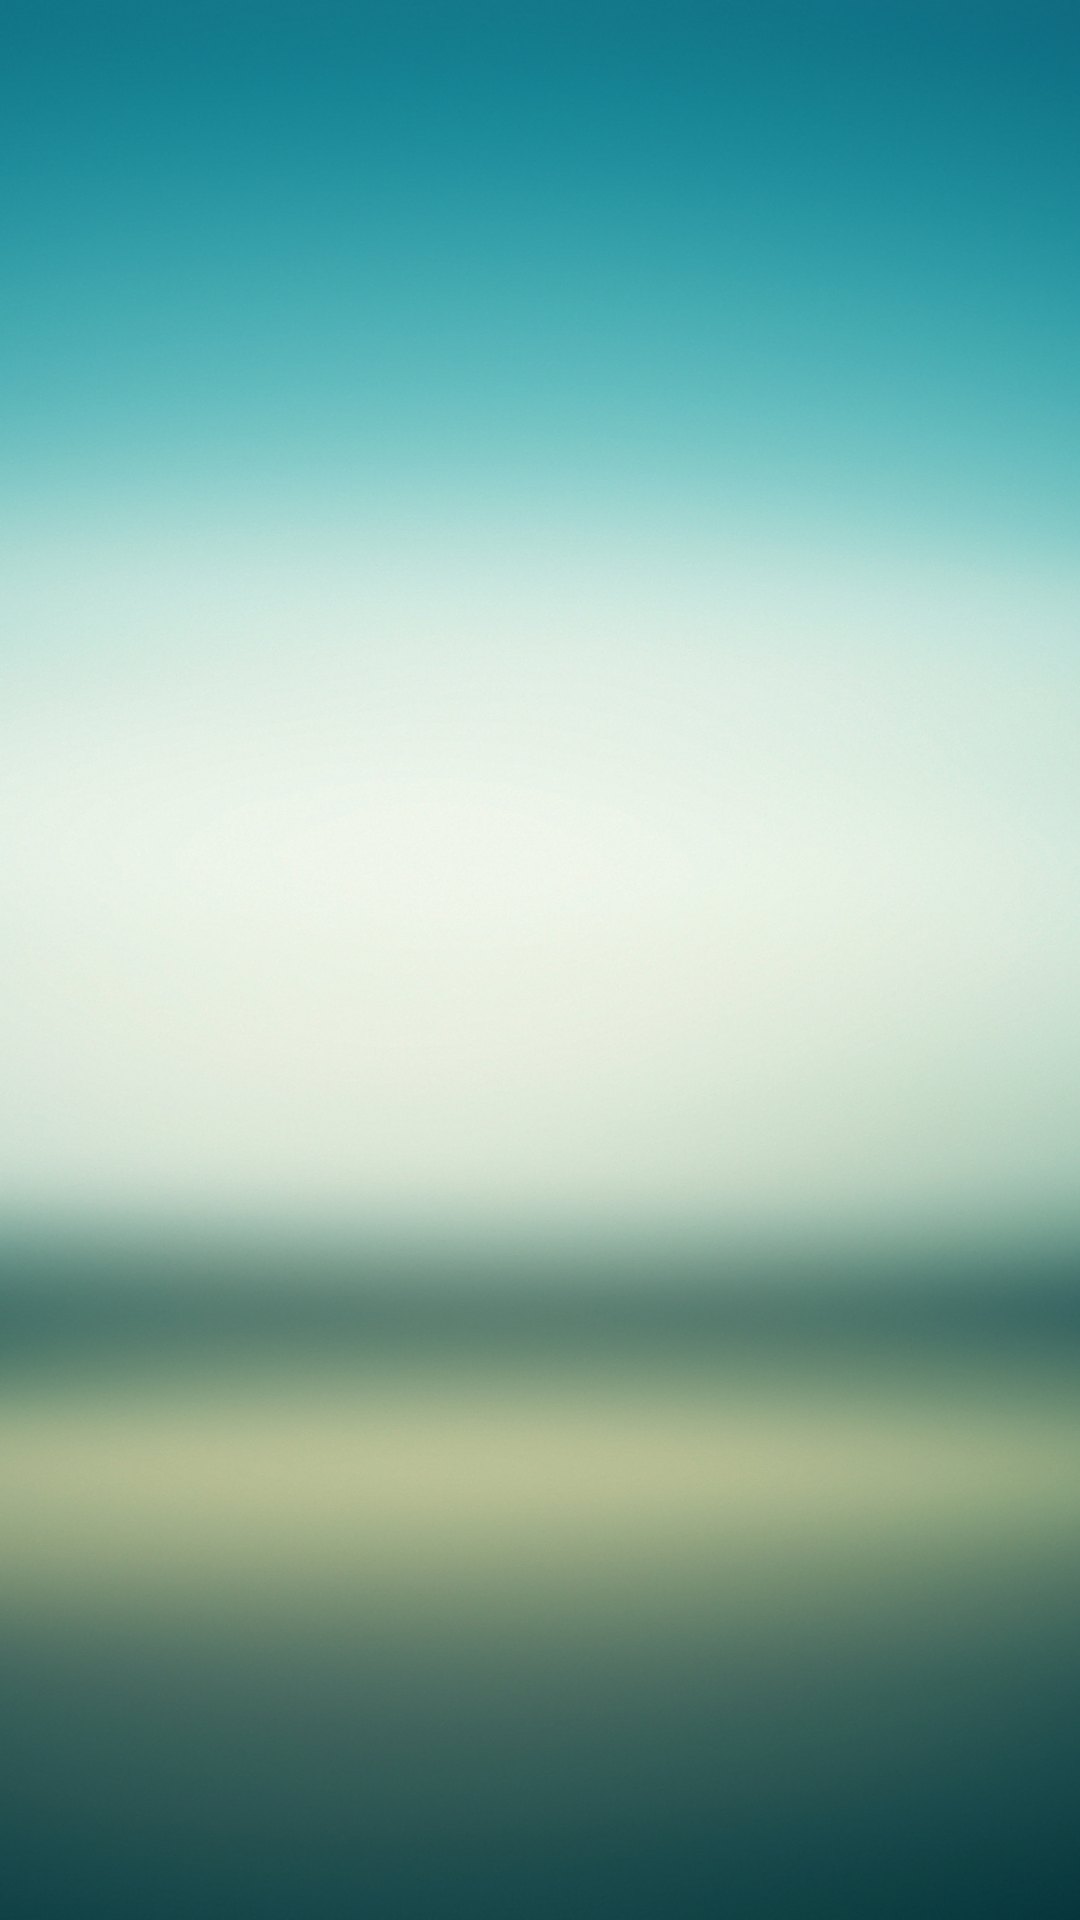 Green Dim iPhone 20 plus Wallpaper   Android wallpaper, Mobile ...